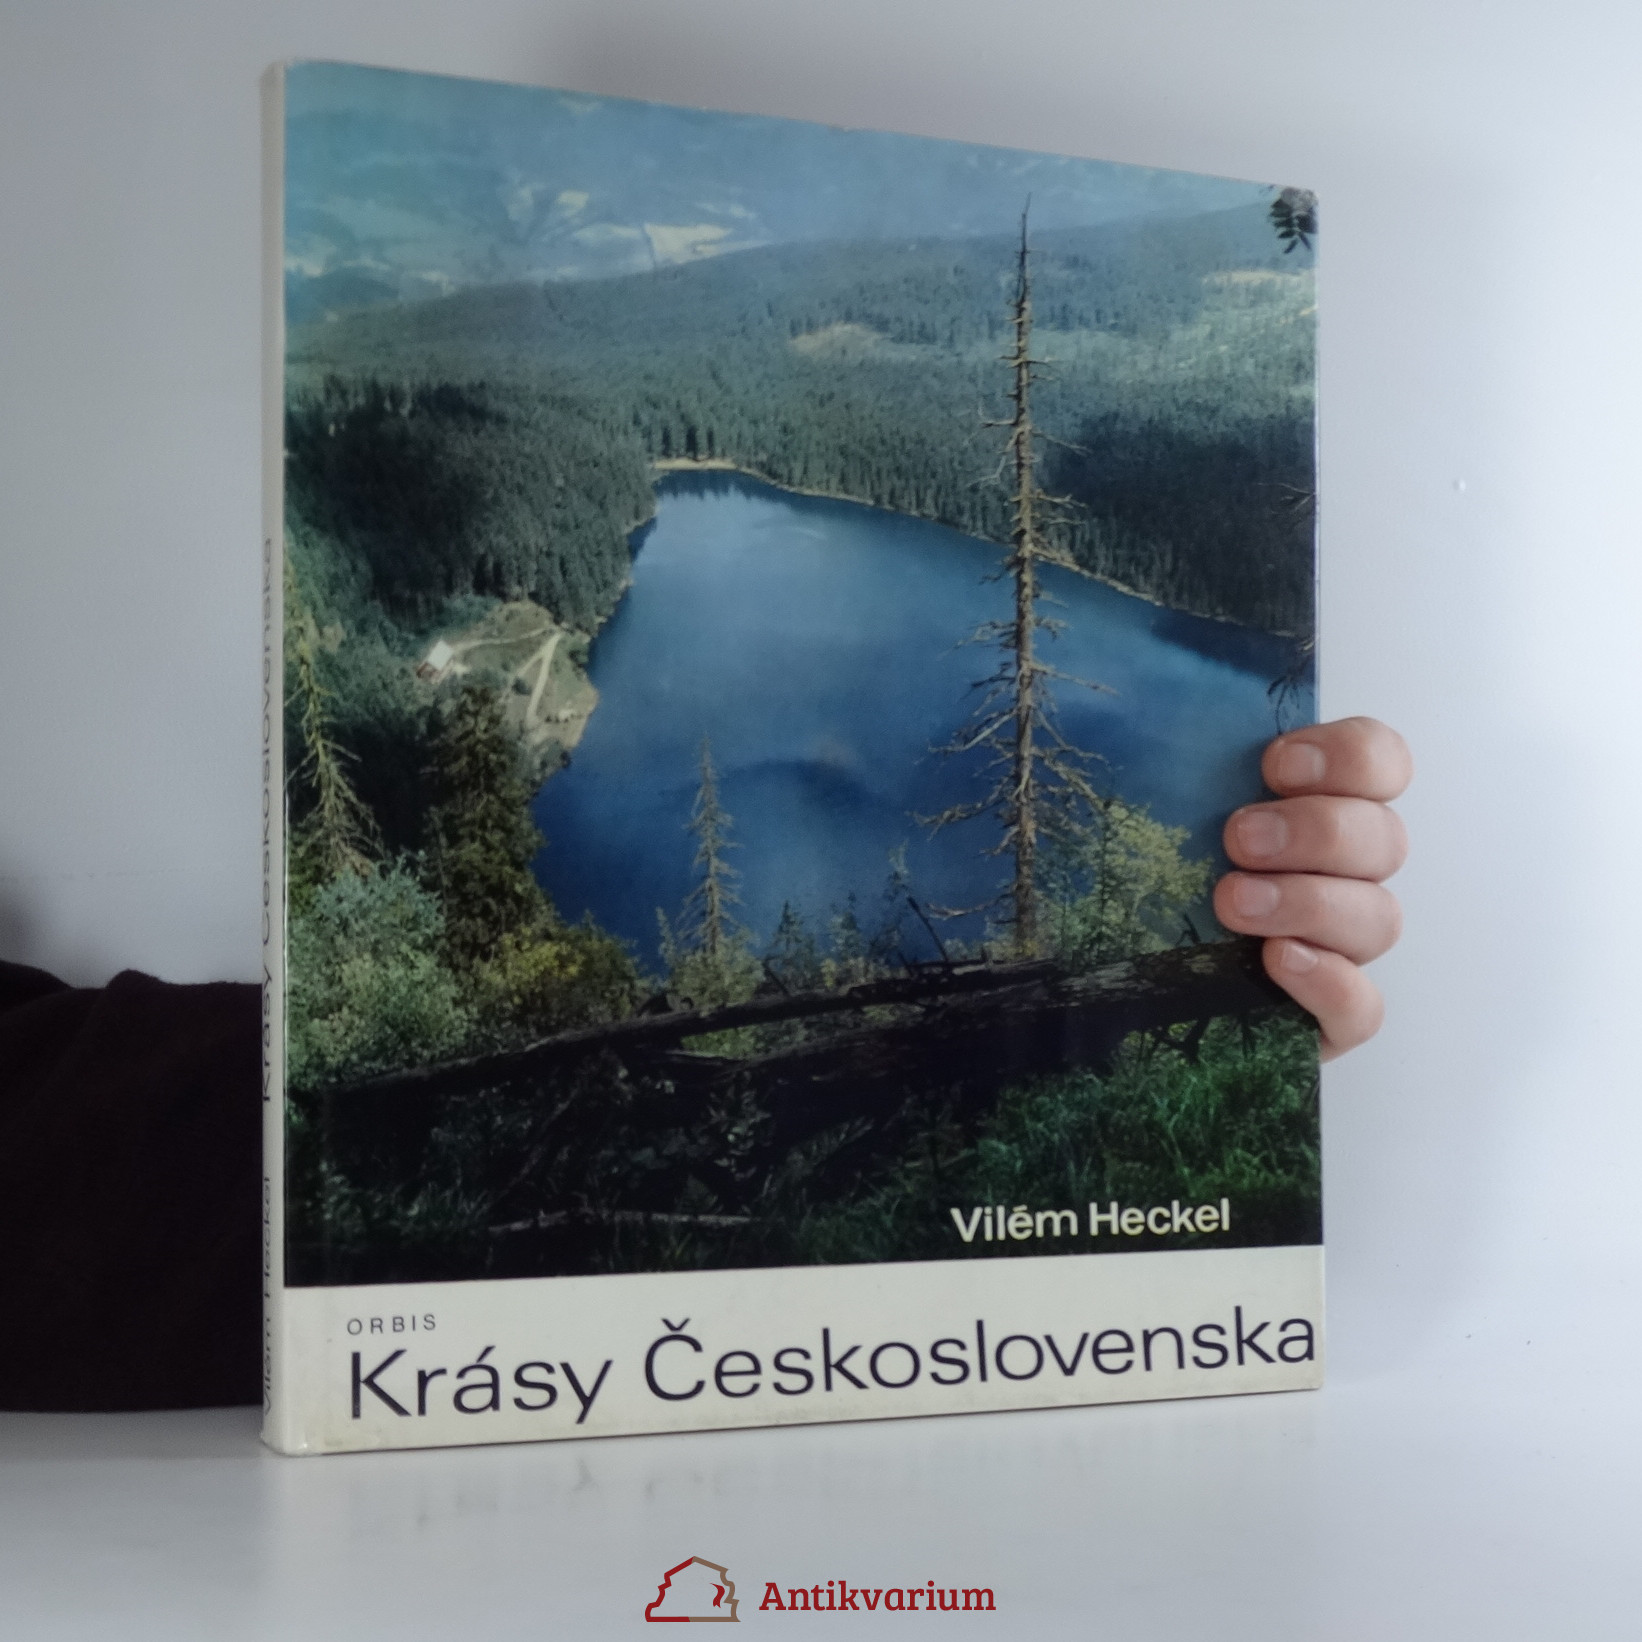 antikvární kniha Krásy Československa, 1970